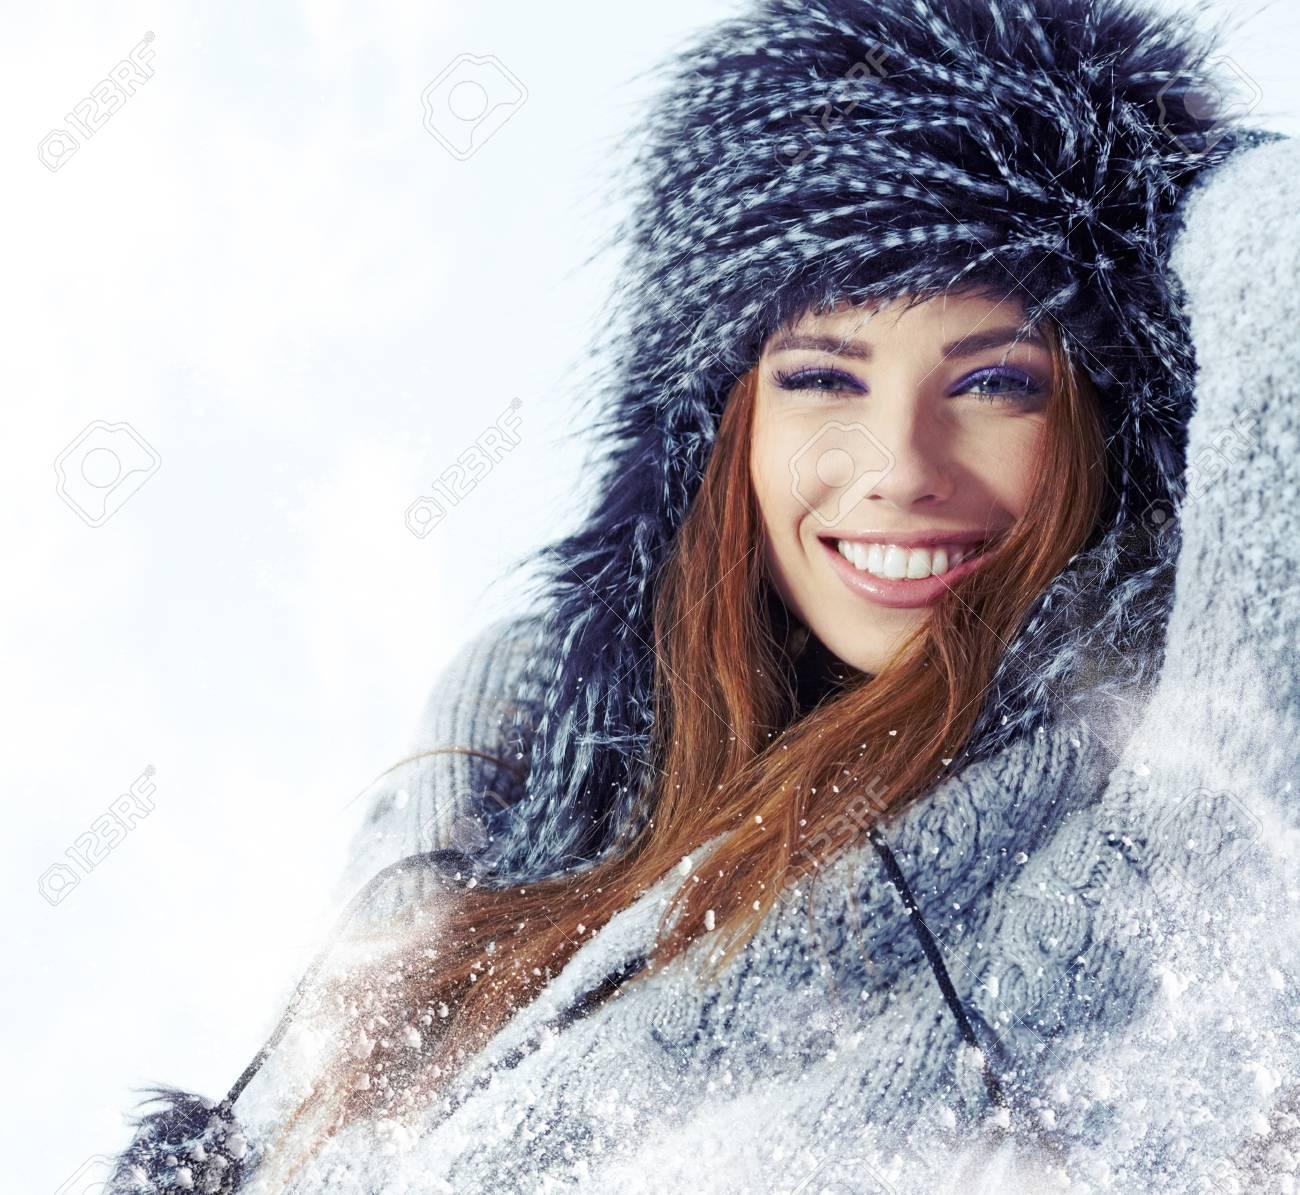 WInter woman portrait outdoor Stock Photo - 17130057